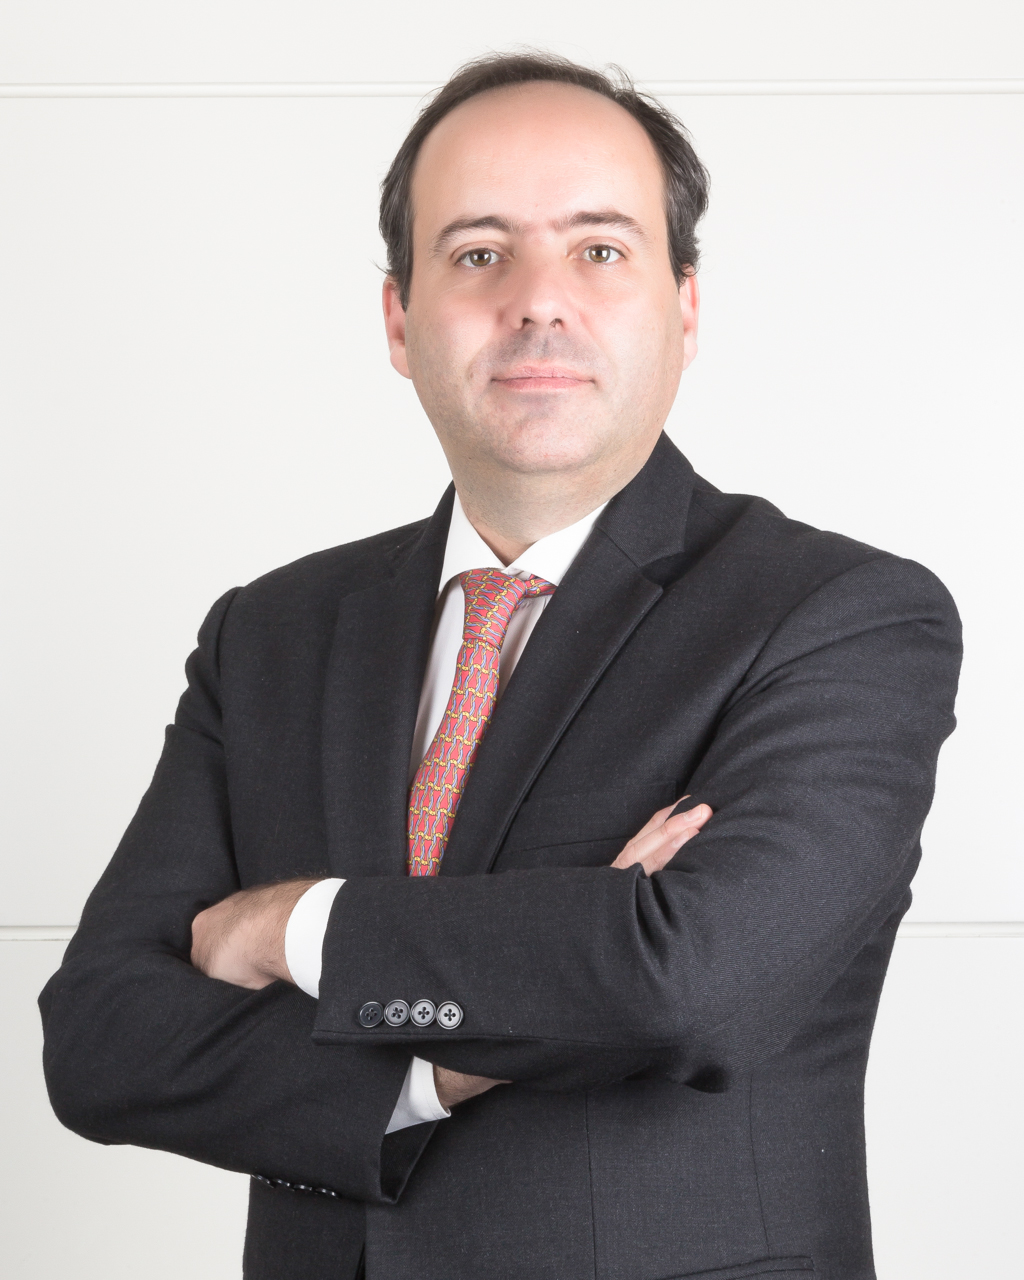 Nuno Cadima Oliveira